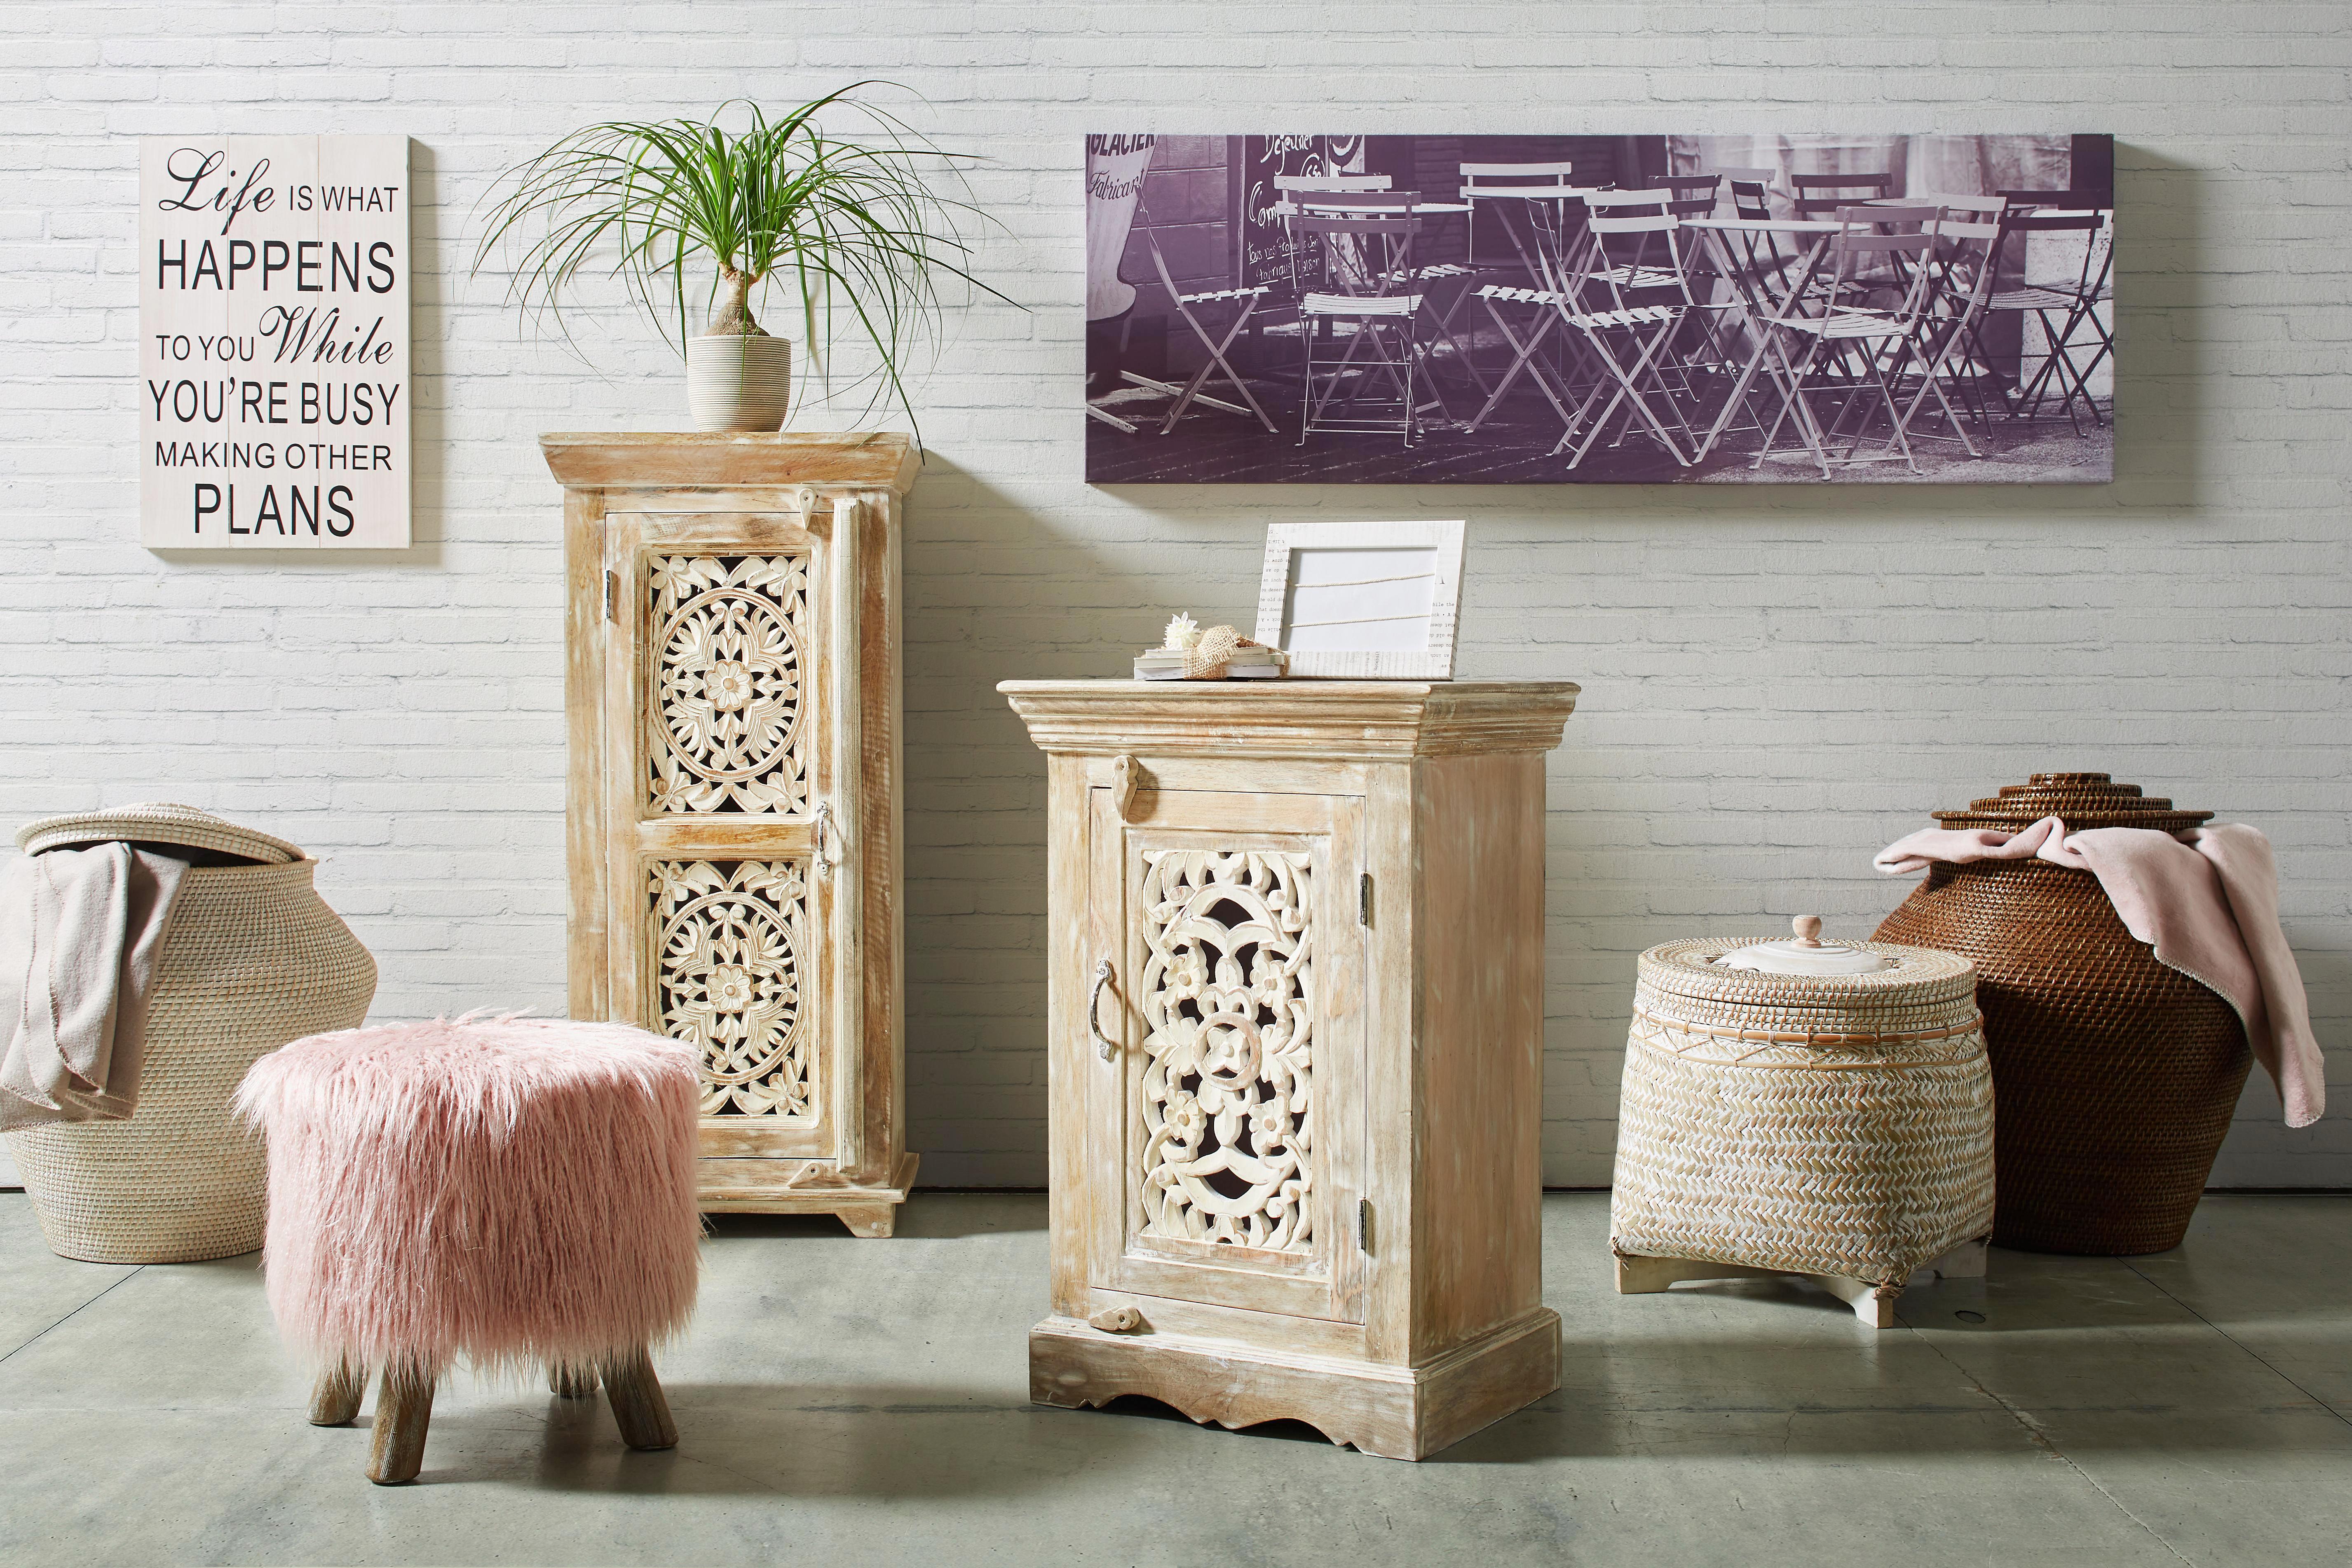 Hocker in Rosa - Rosa/Weiß, MODERN, Holz/Textil (38/39cm)